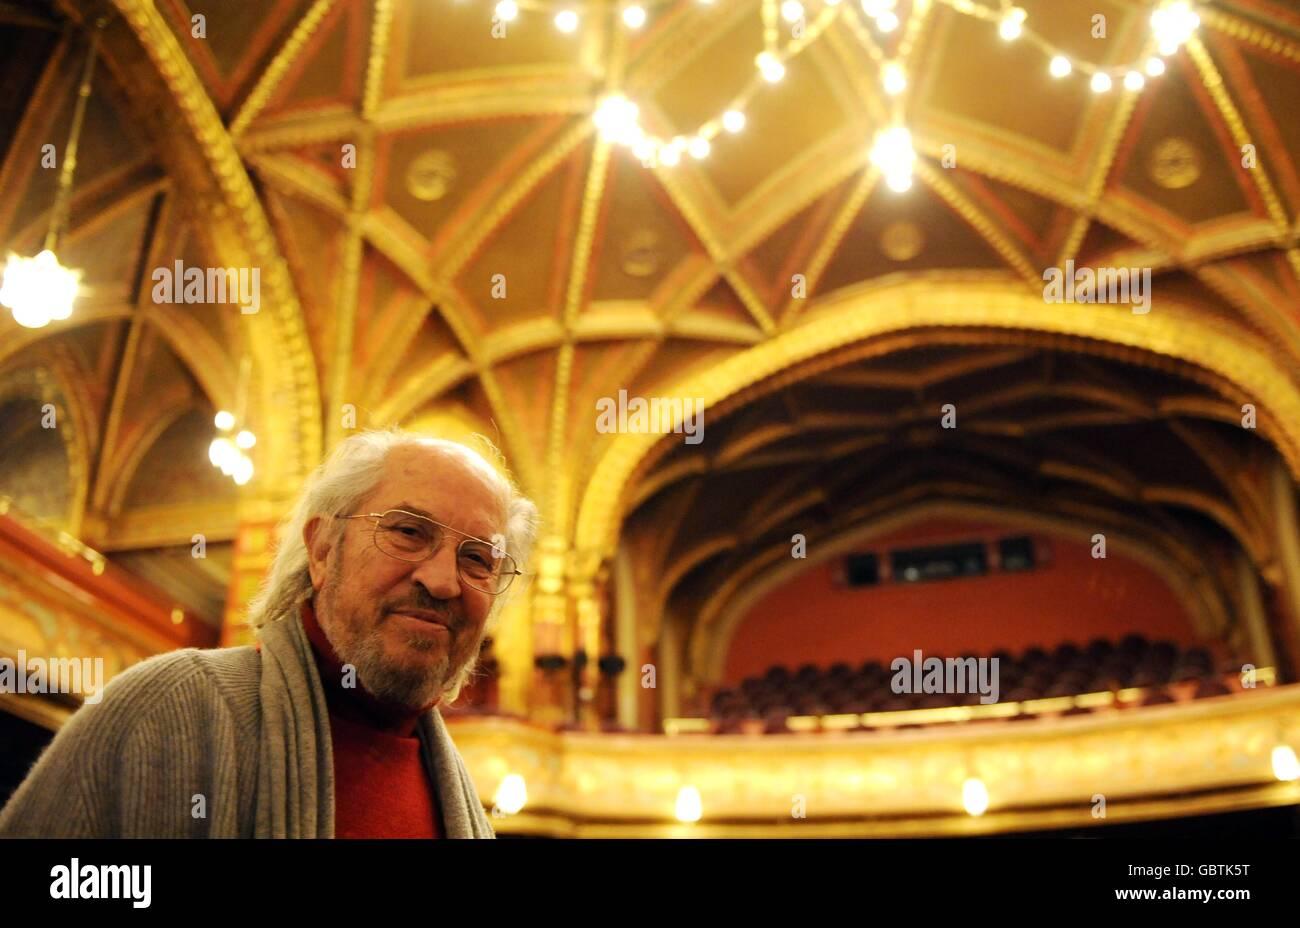 Vittorio Storaro, Italian cinematographer    Credit © Giuseppe Lian/Sintesi/Alamy Stock Photo - Stock Image